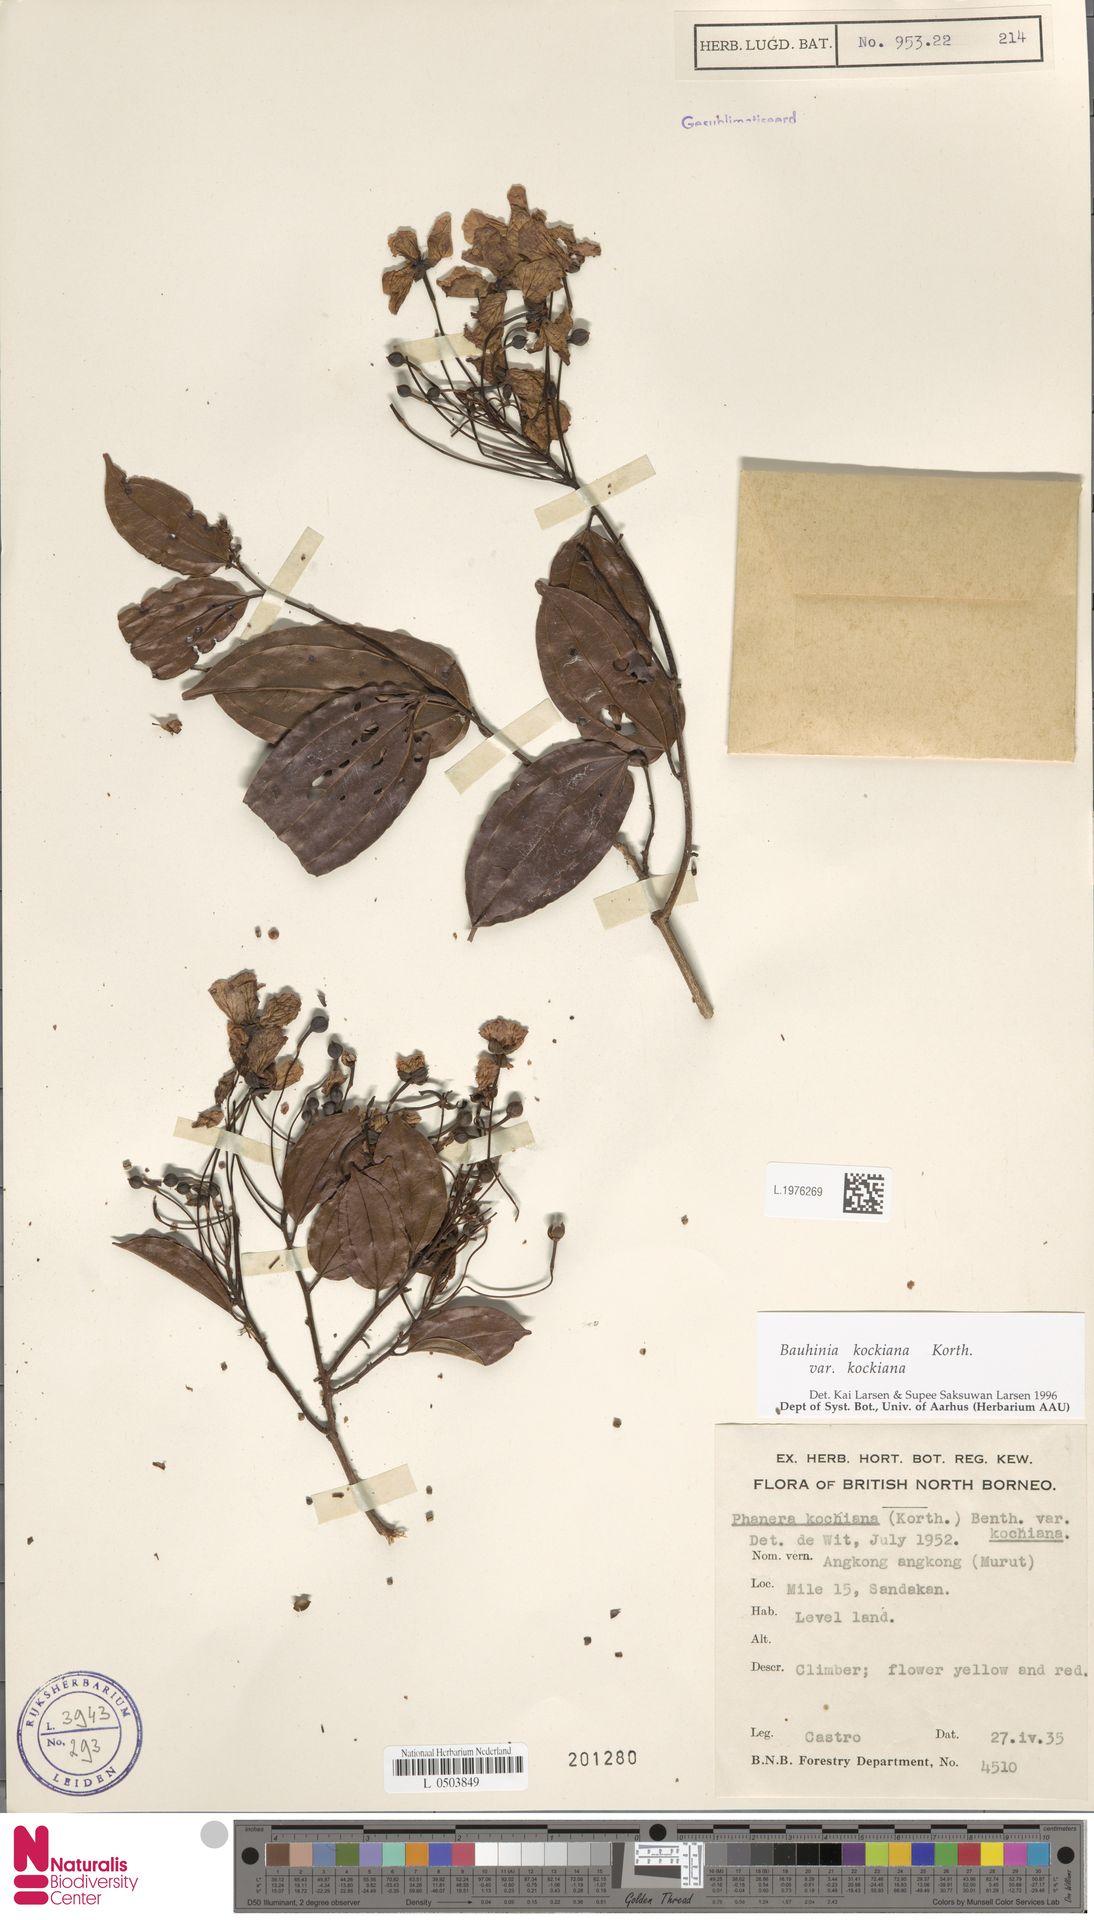 L.1976269 | Bauhinia kockiana var. kockiana